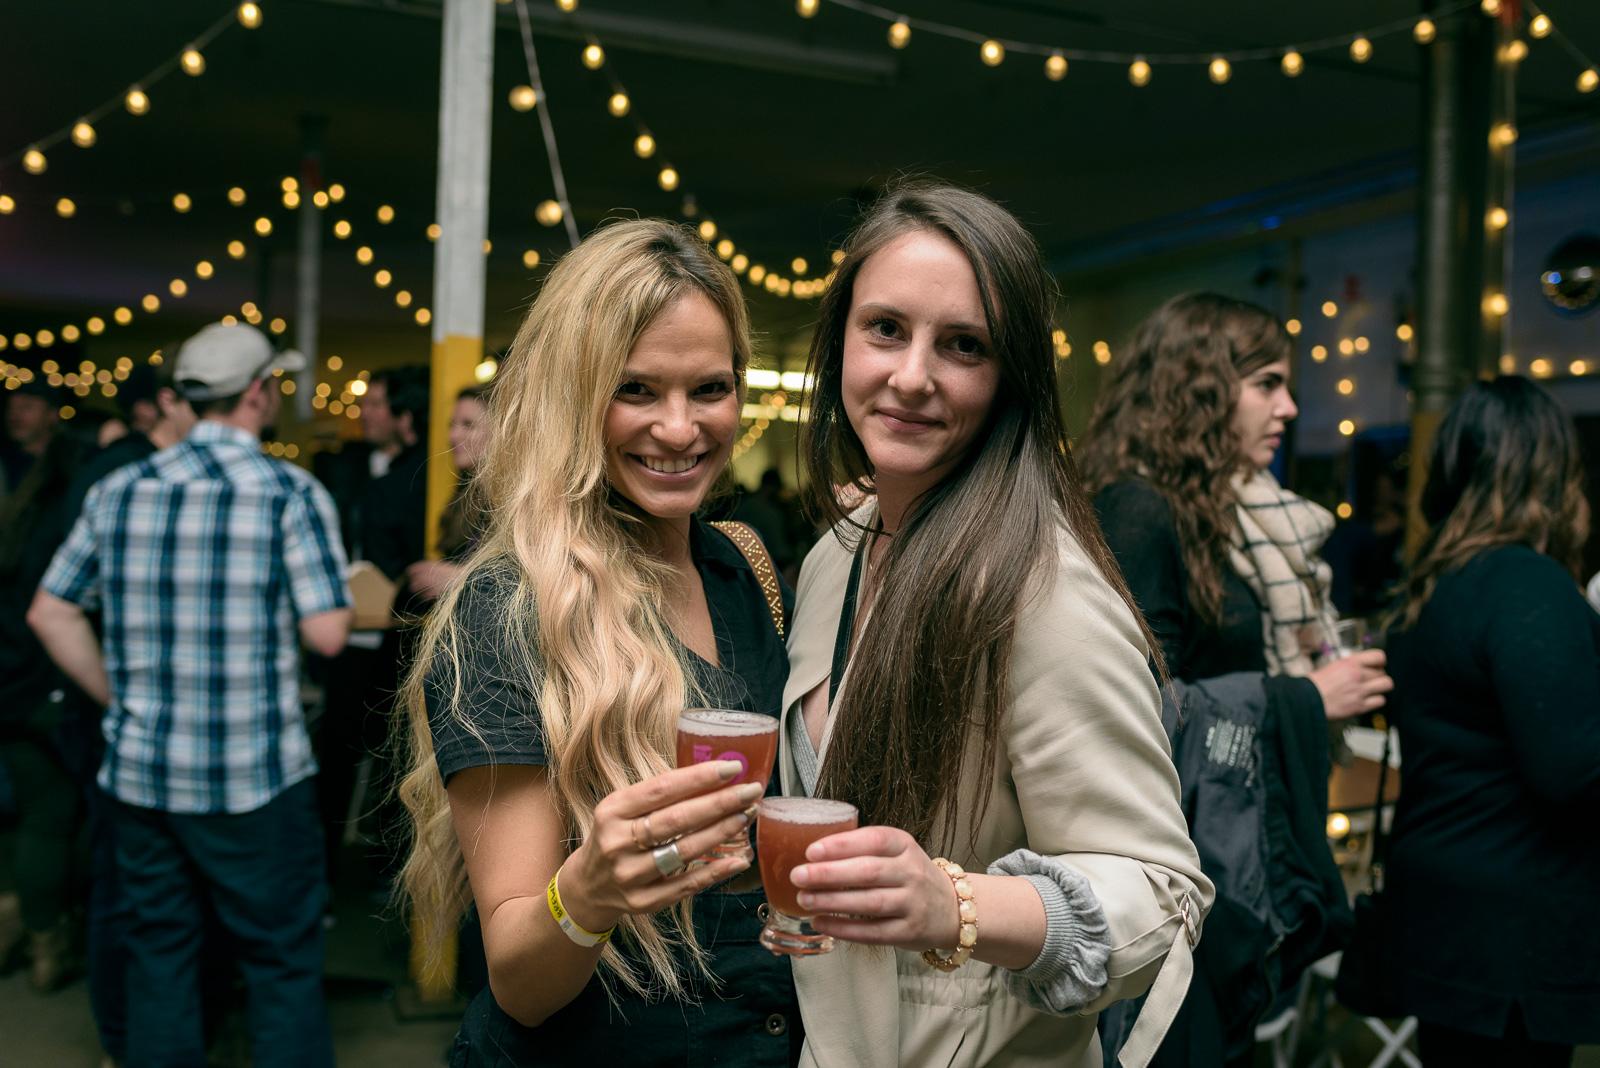 brewha-caskfest-blog-25.jpg